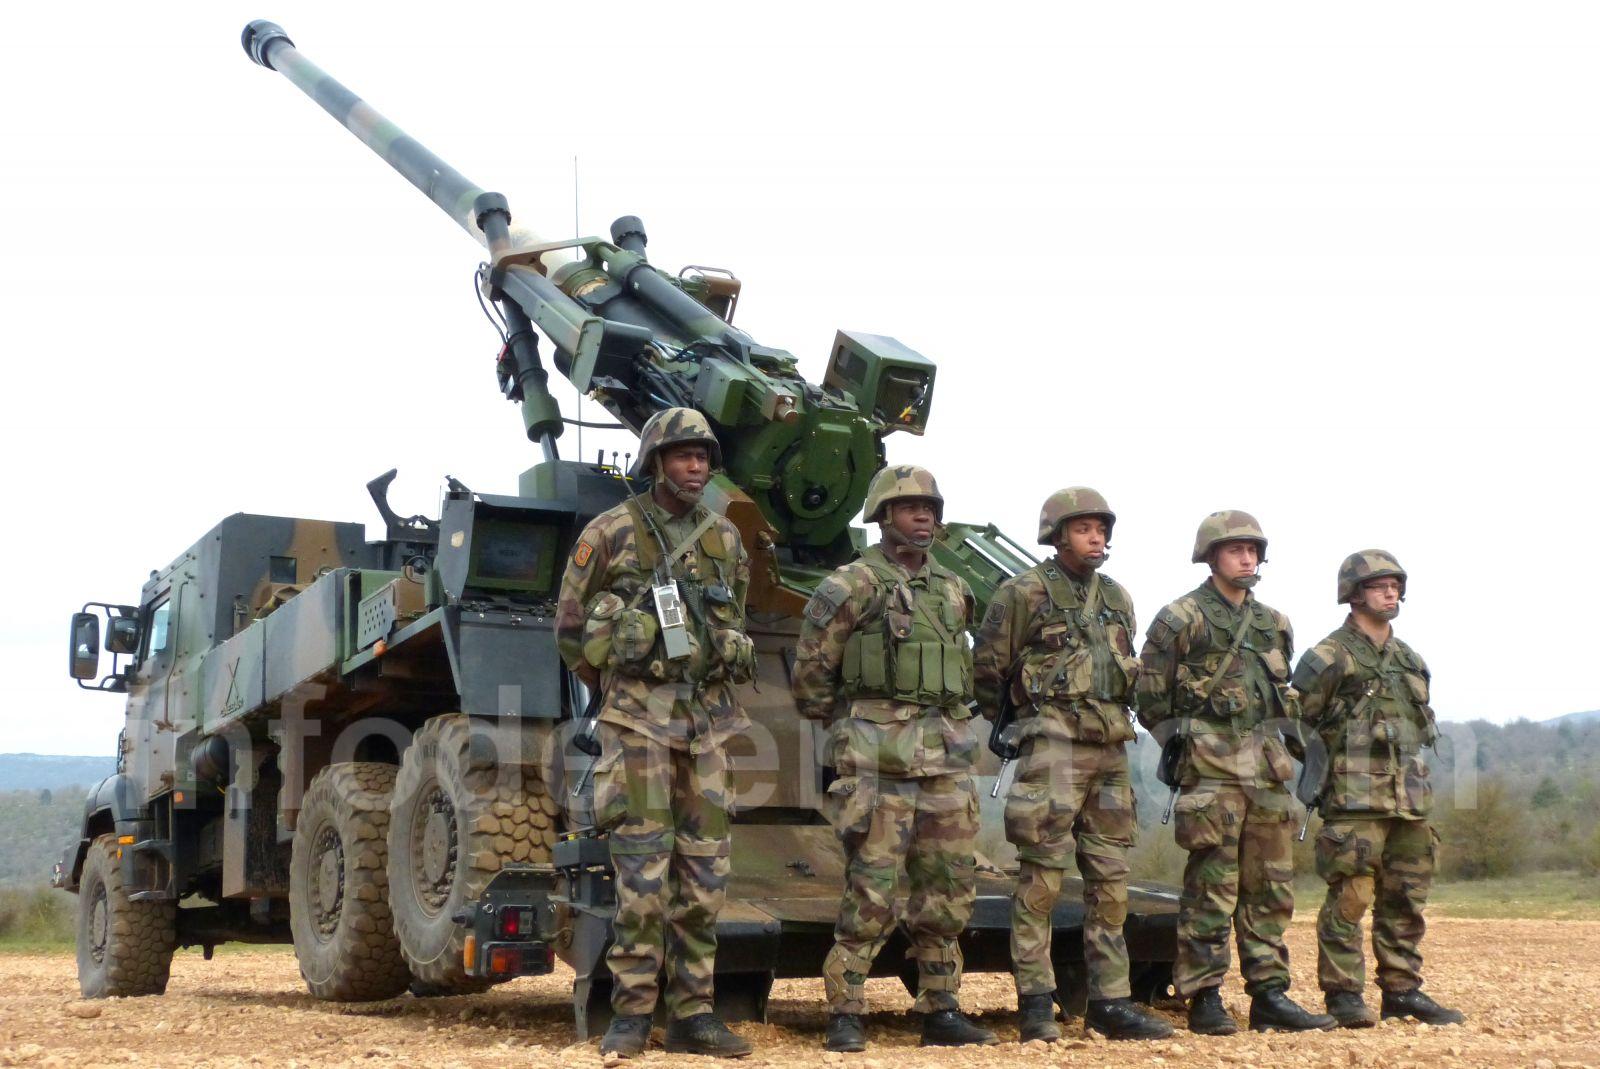 Francia suministrará medios de artillería al ejército iraquí